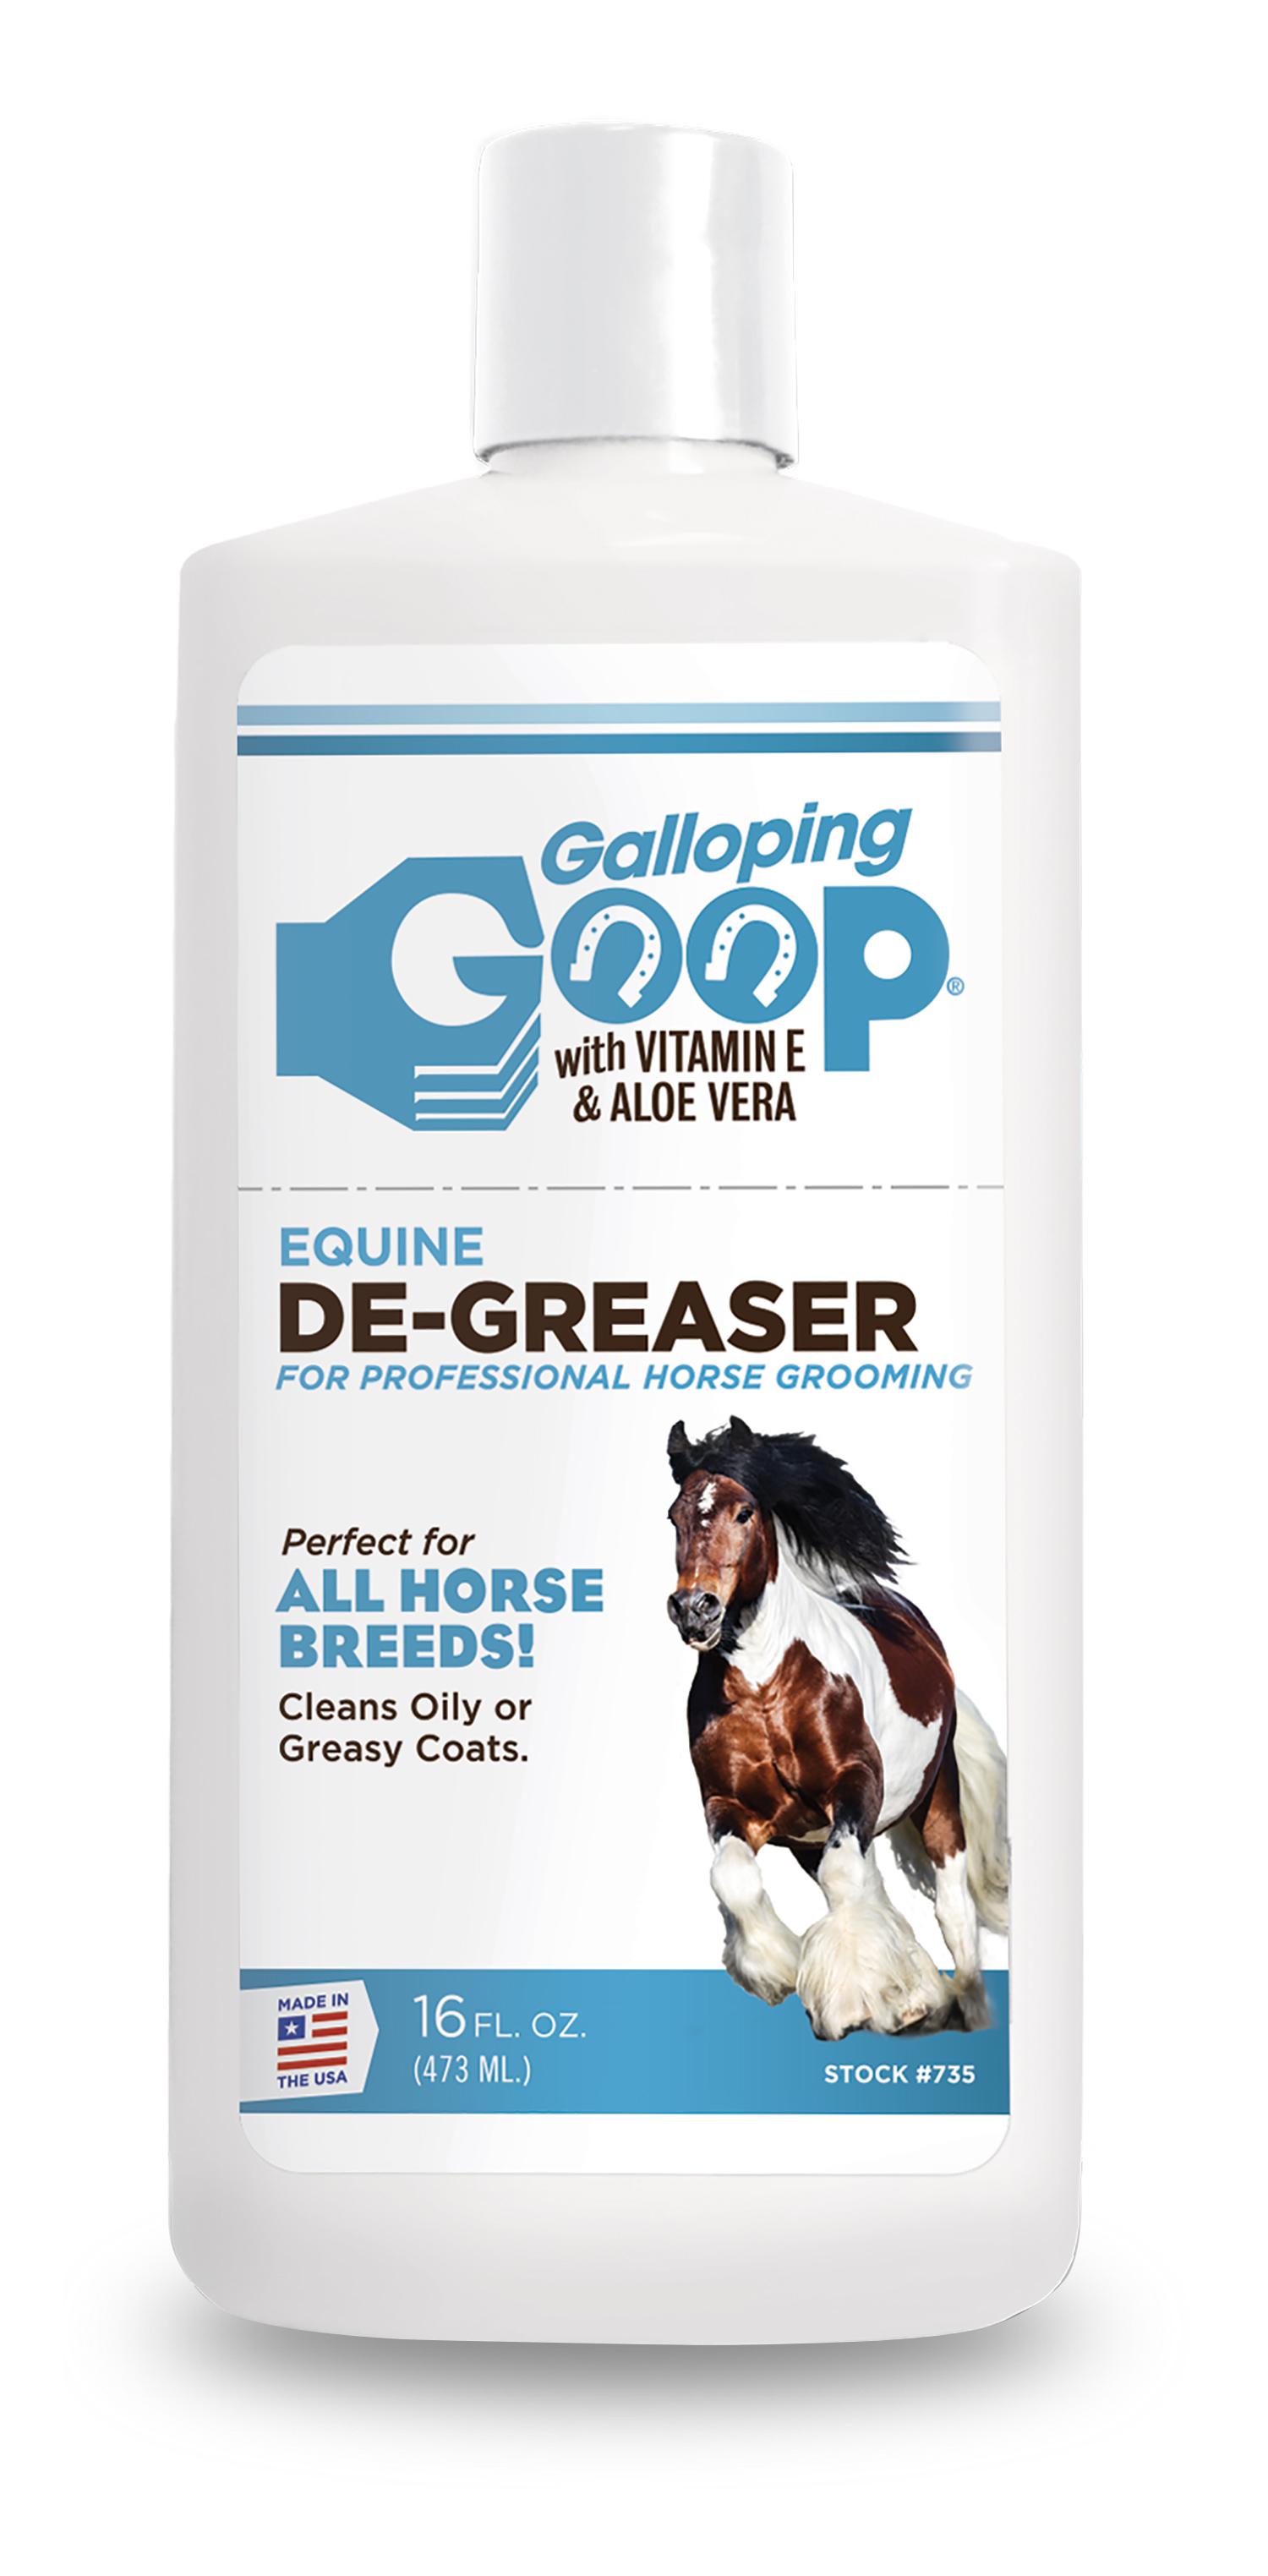 Moms-Goop-Galloping-735-DeGreaserBottle16oz.jpg